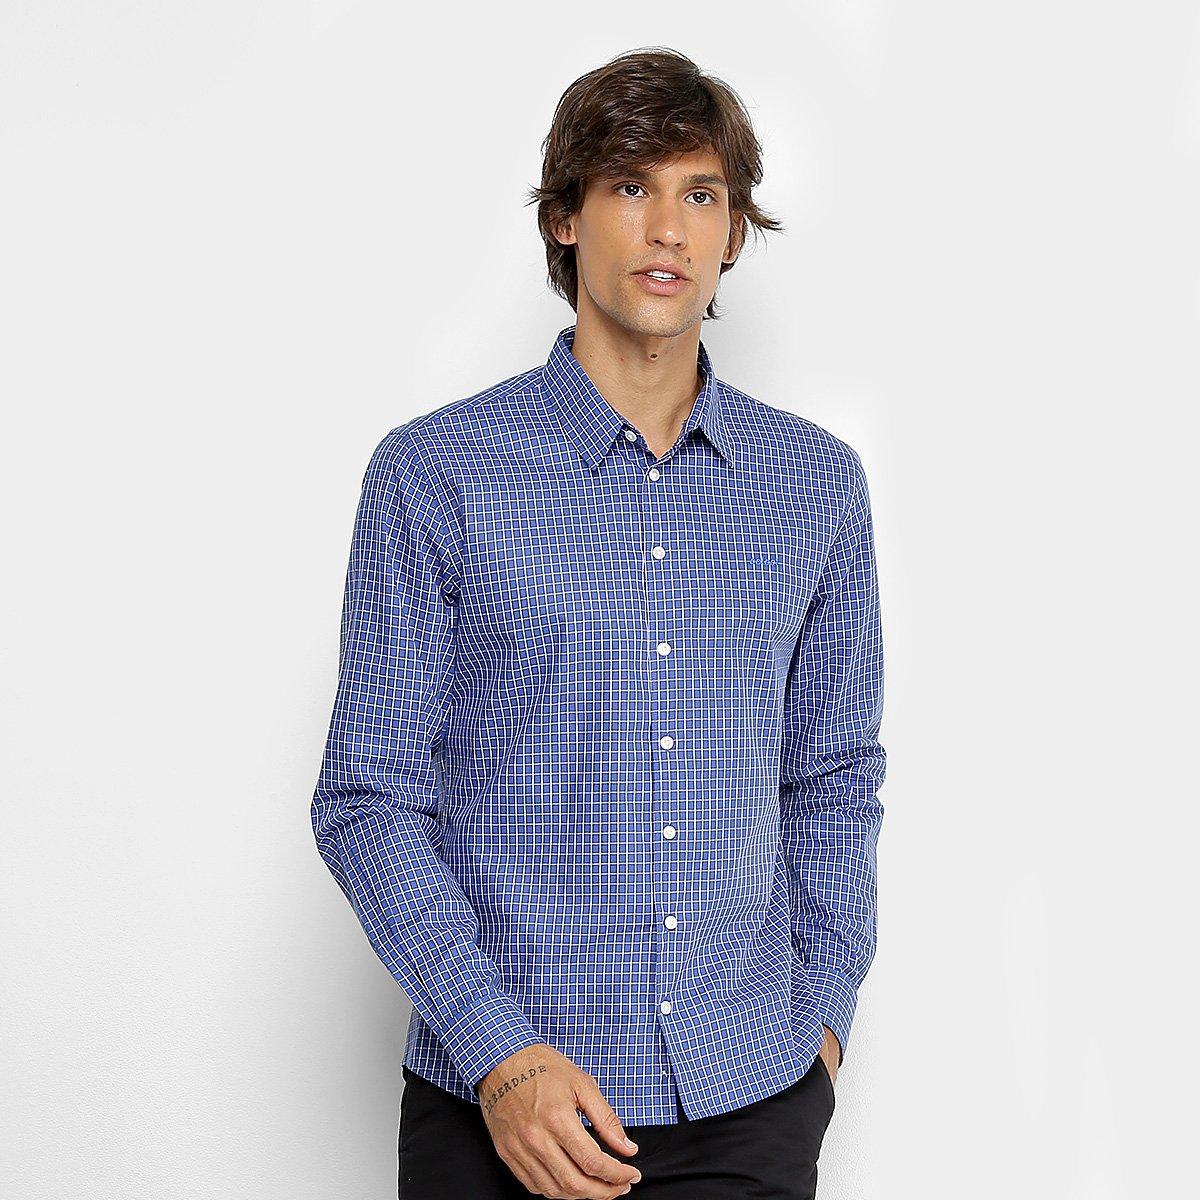 d16f74b10 Camisa Slim Xadrez Colcci Manga Longa Masculina